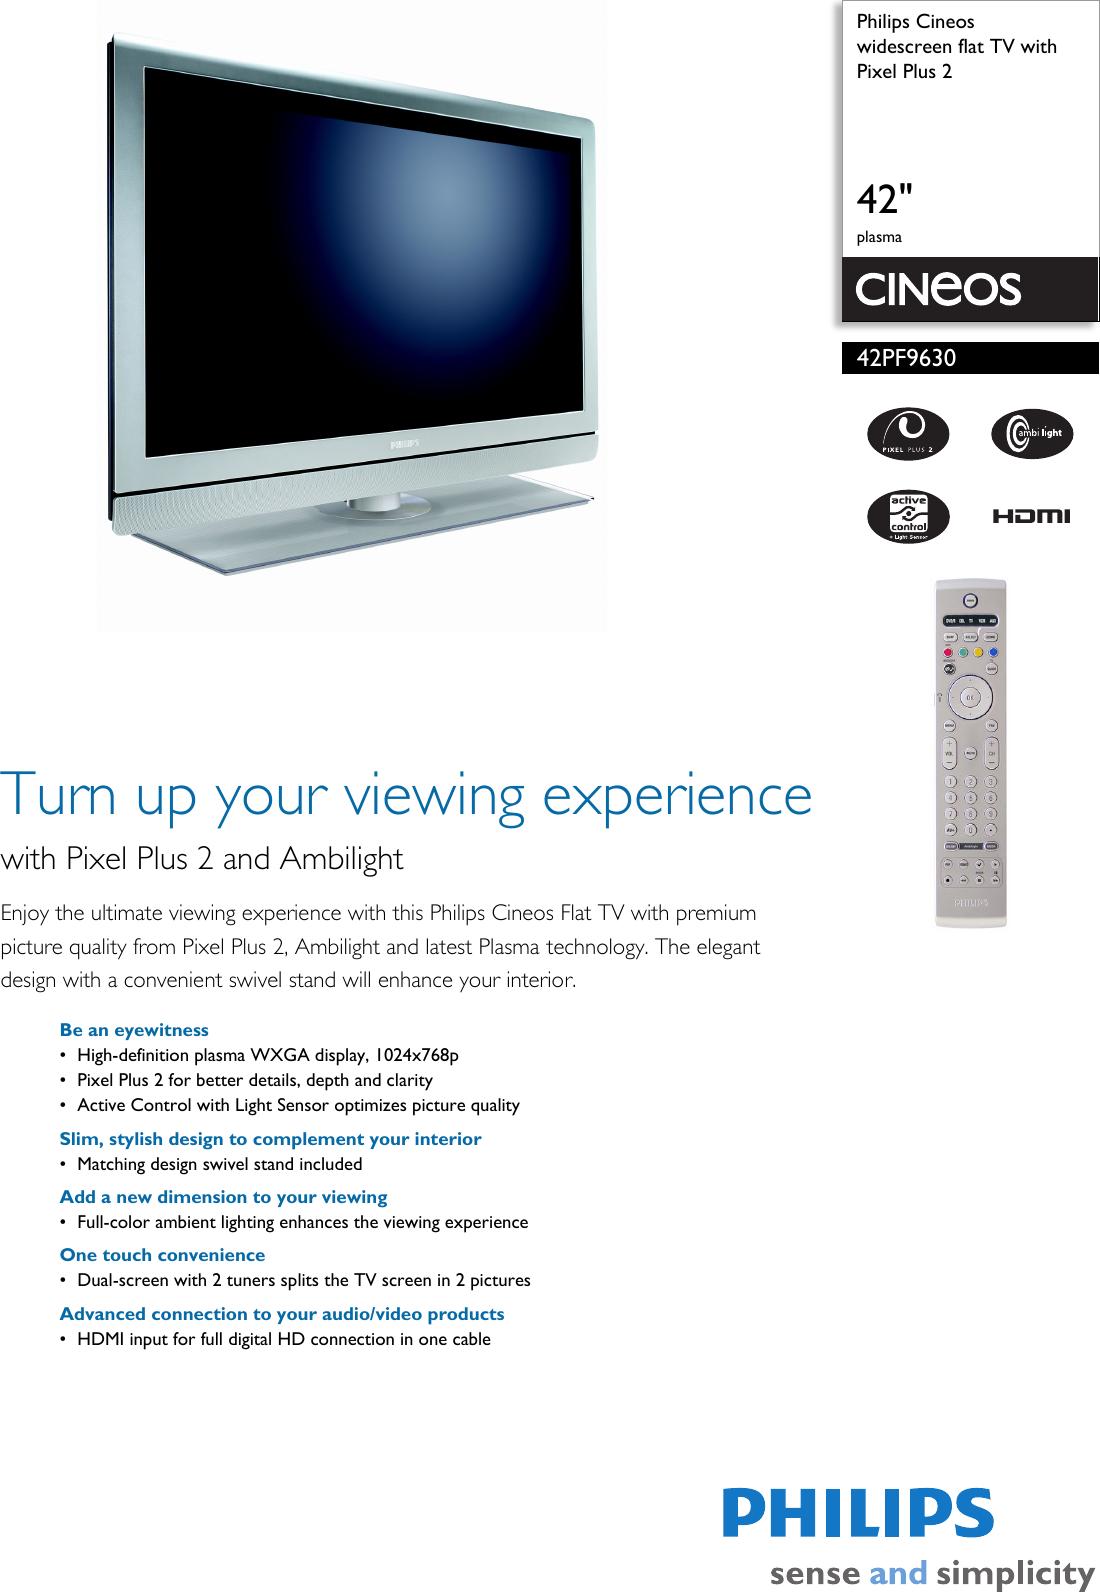 philips cineos 42pf9630 users manual 42pf9630 78 widescreen flat tv rh usermanual wiki HV10 Philips Remote Control Manuals Philips User Manual